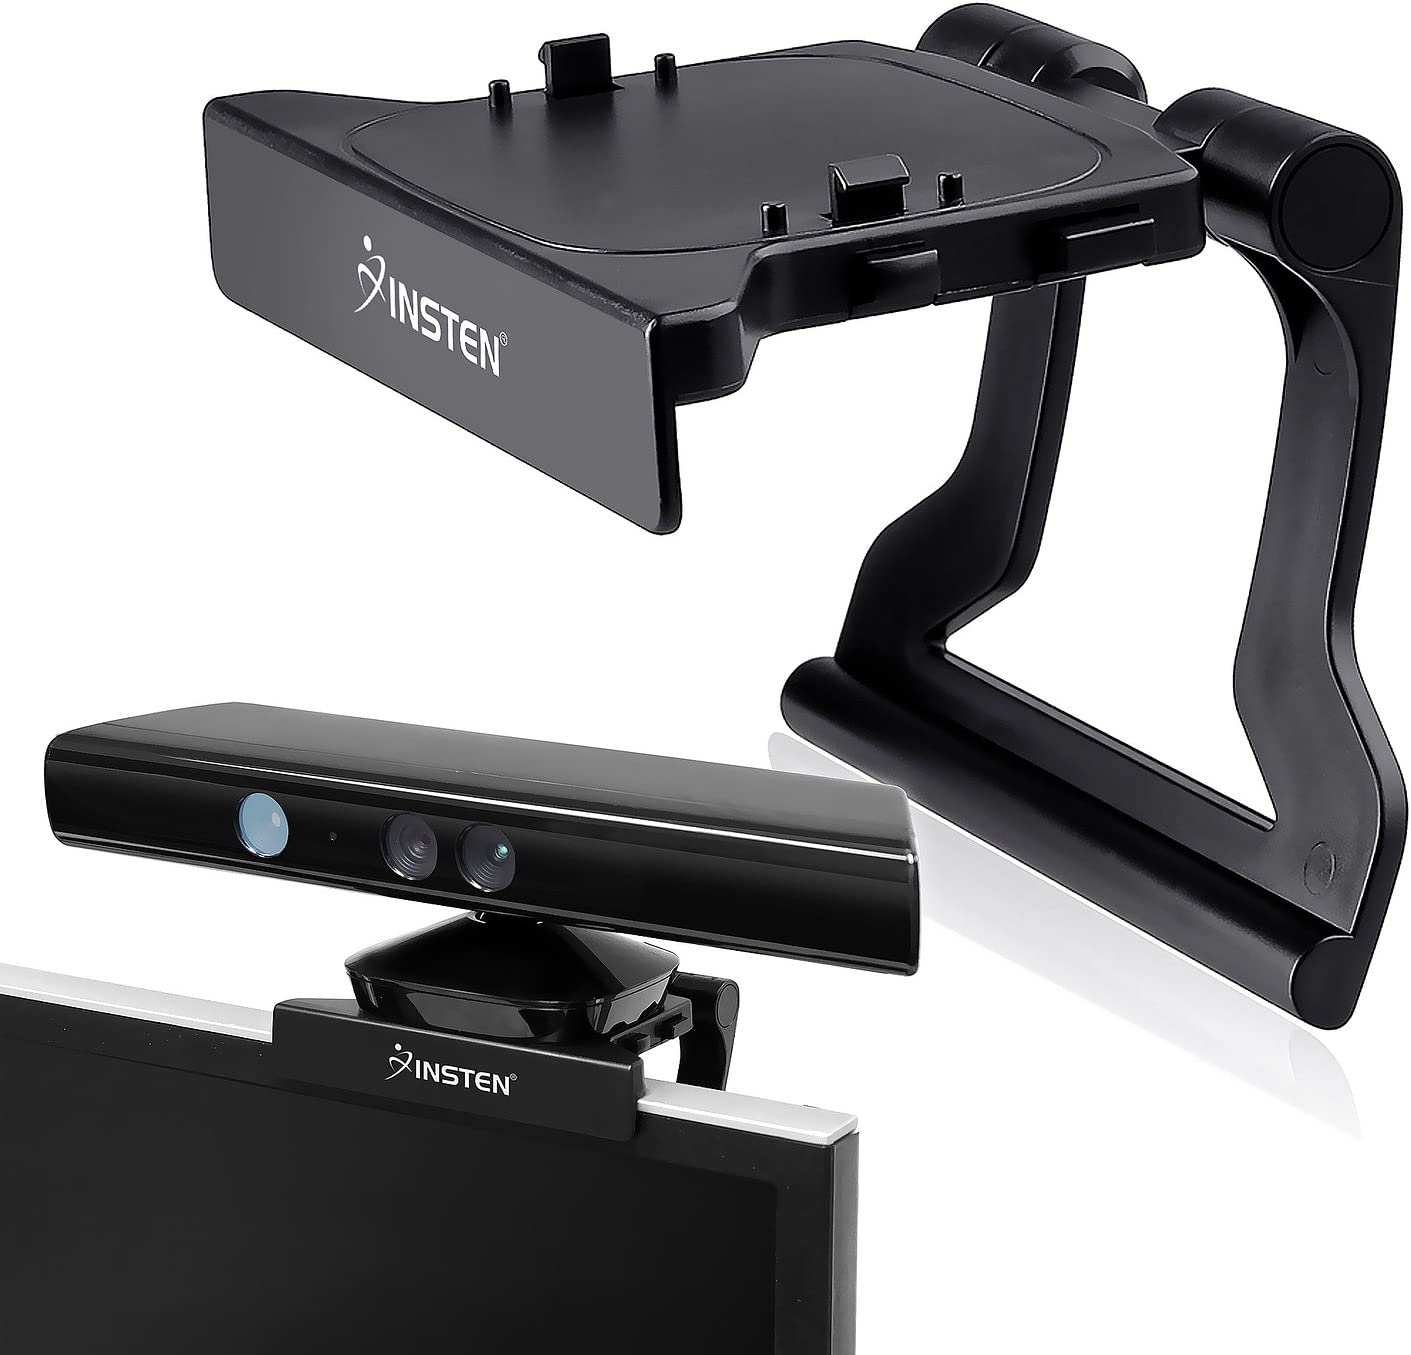 Insten compatible con Microsoft Xbox 360 Kinect Sensor Monte Holder, Negro: Amazon.es: Videojuegos